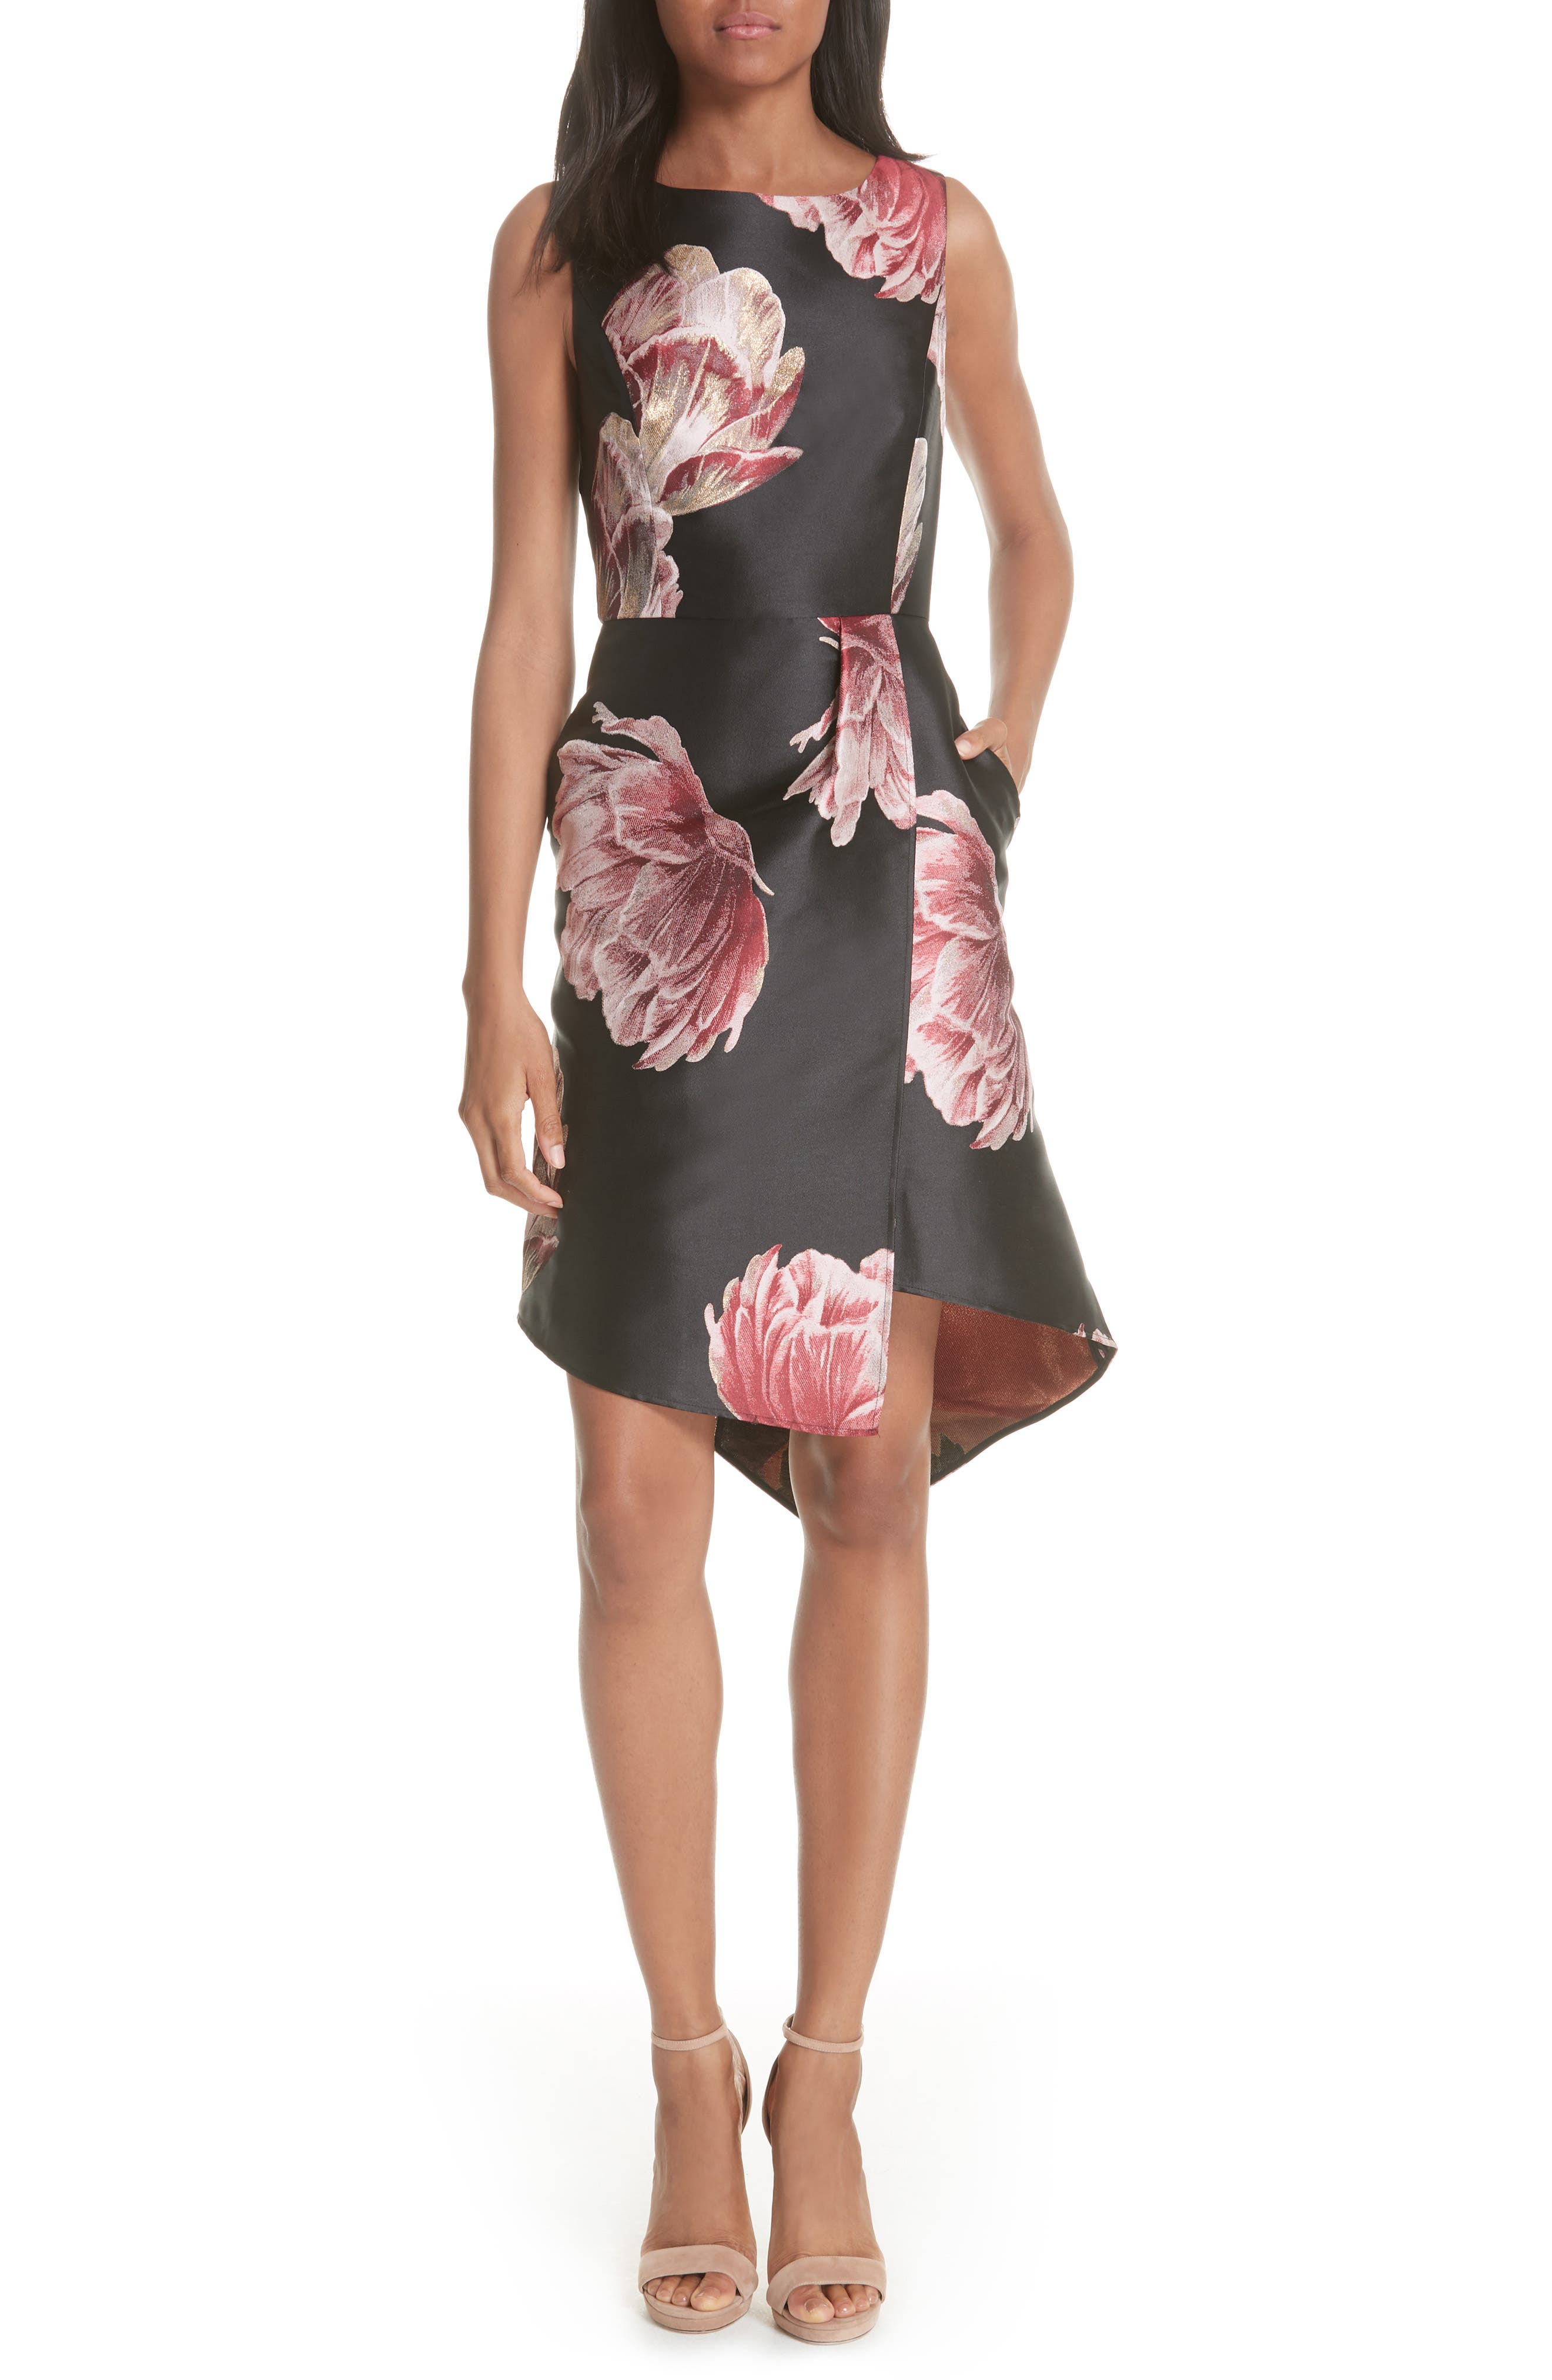 Eyvii Bay of Honour Asymmetrical Dress,                             Main thumbnail 1, color,                             Black